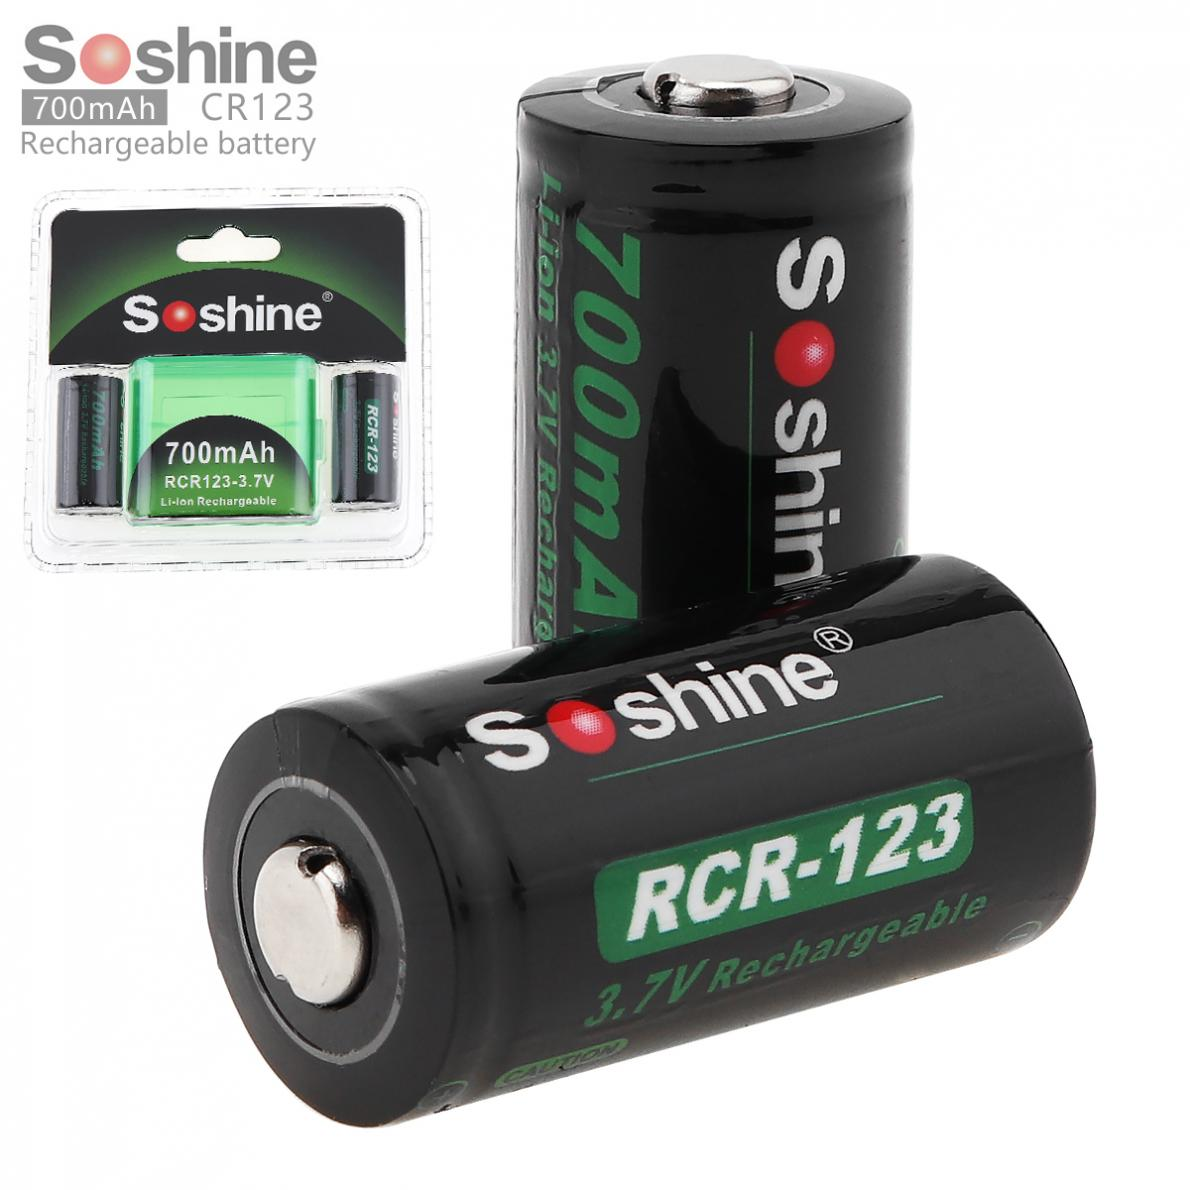 Soshine 2pcs RCR123 16340 Li-ion Rechargeable Battery 700mAh 3.7V Lithium batteries + Battery Case Storage Box стоимость